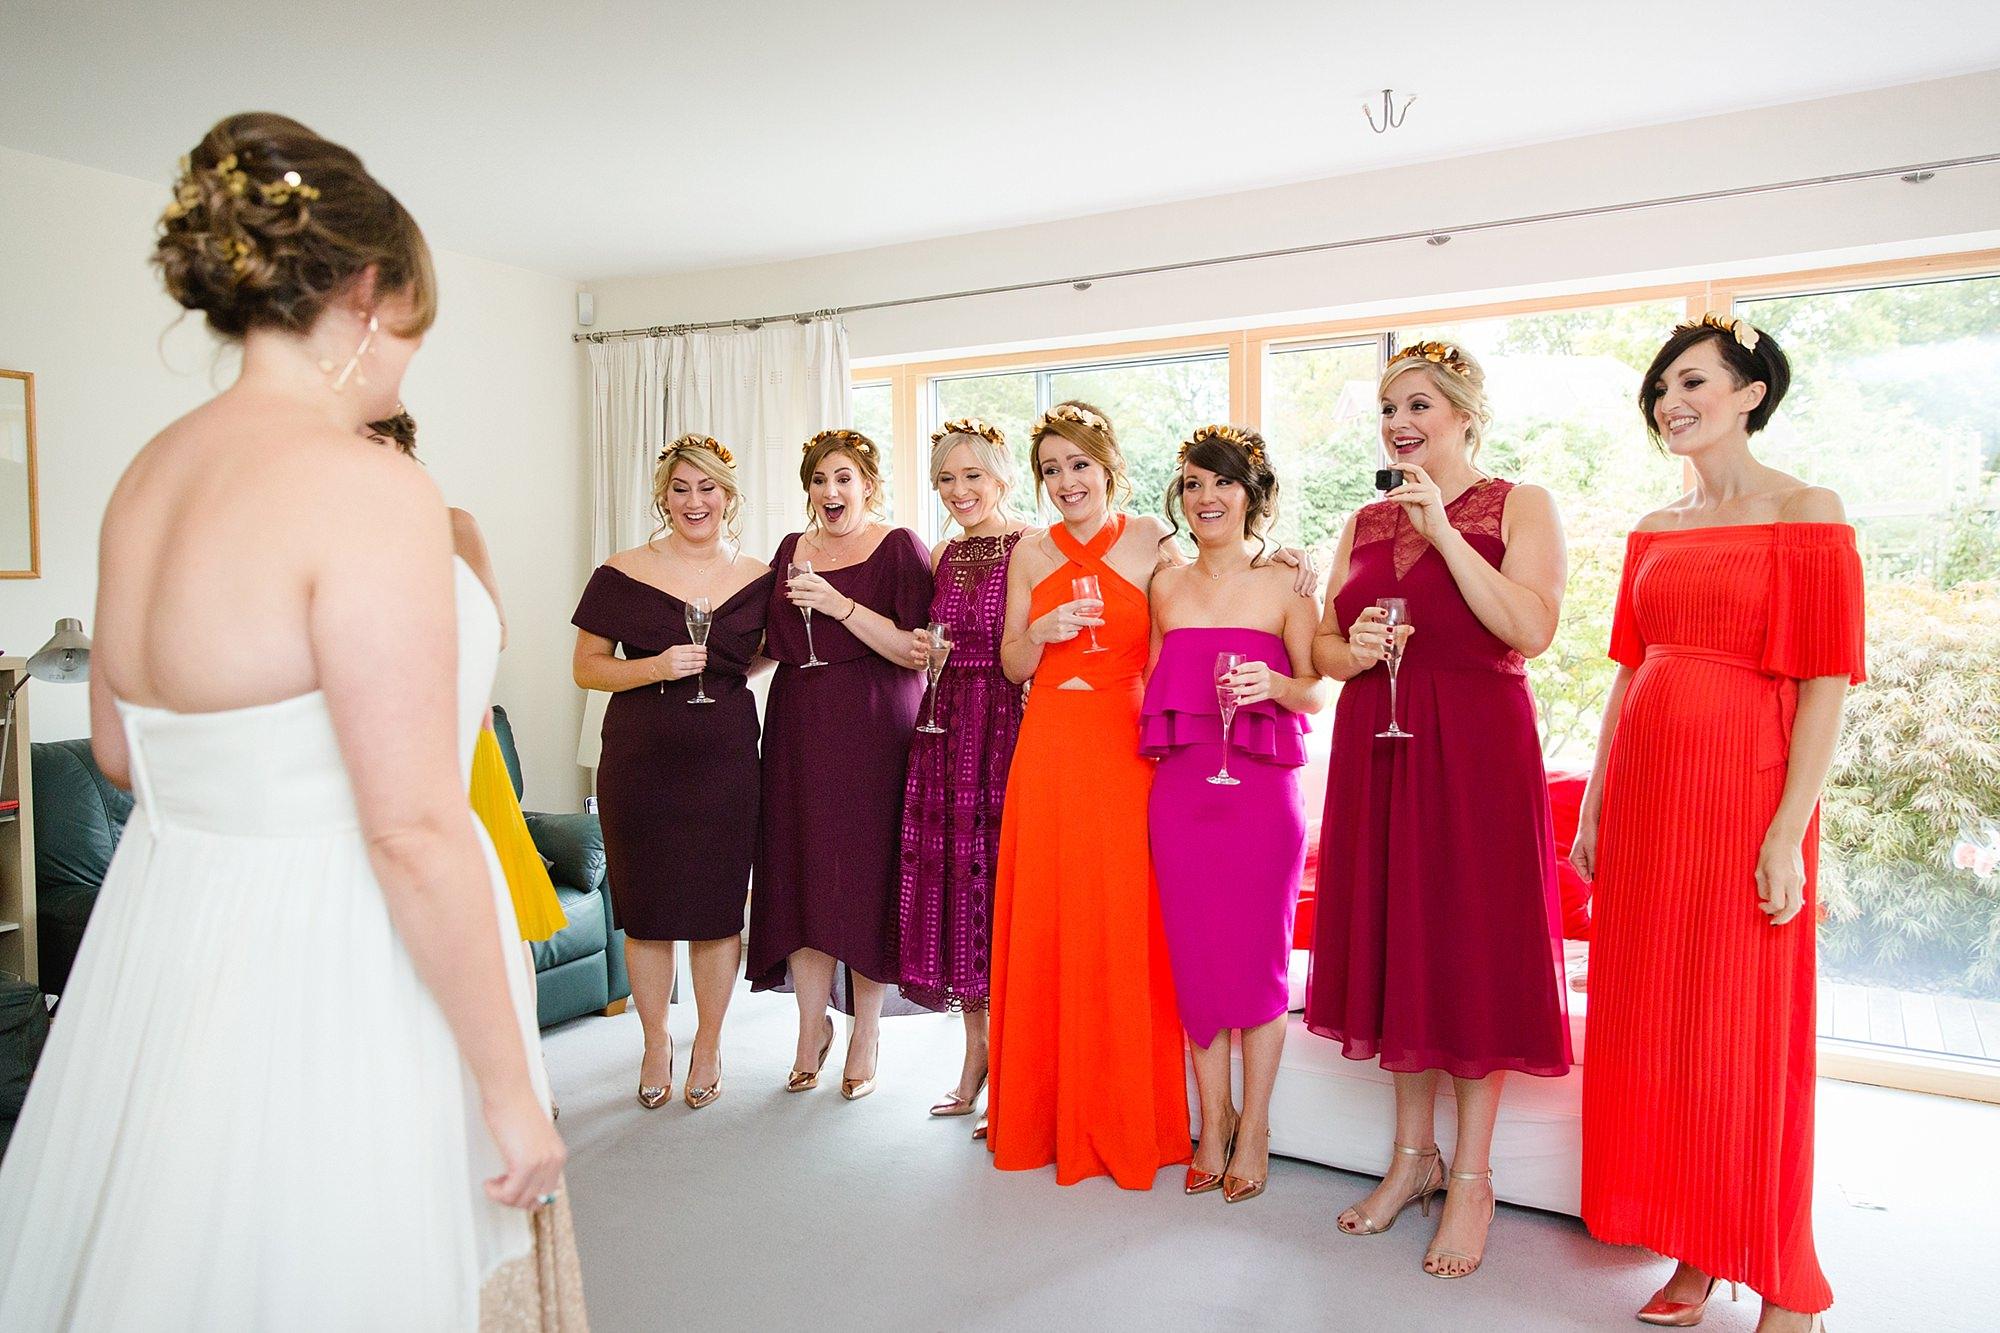 Fun London Wedding bridesmaids react to the bride in her dress